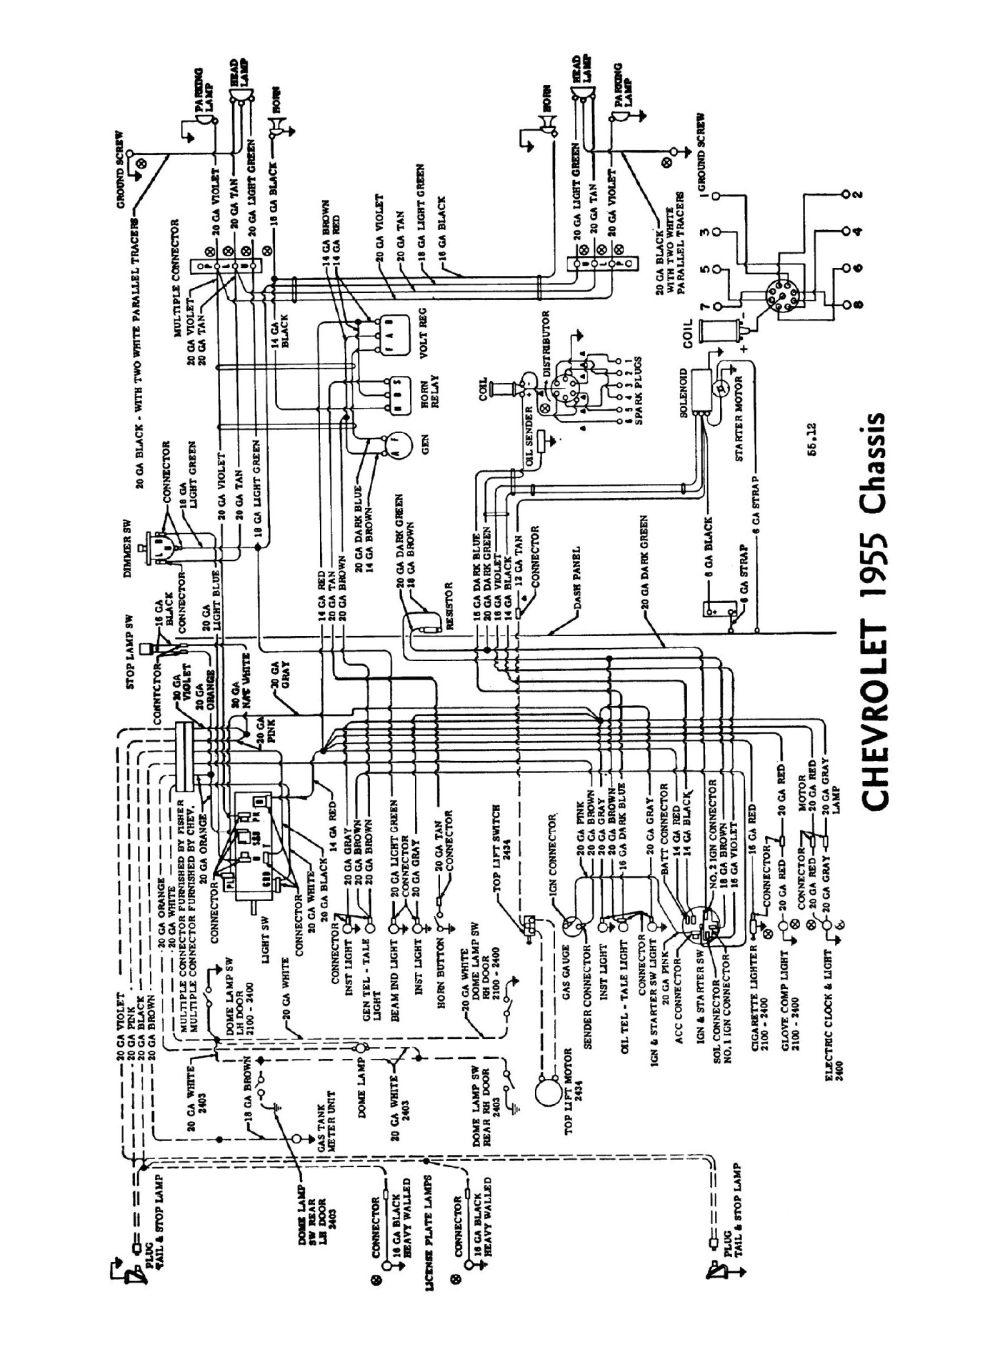 medium resolution of 1955 truck wiring diagrams 1955 passenger car wiring 2